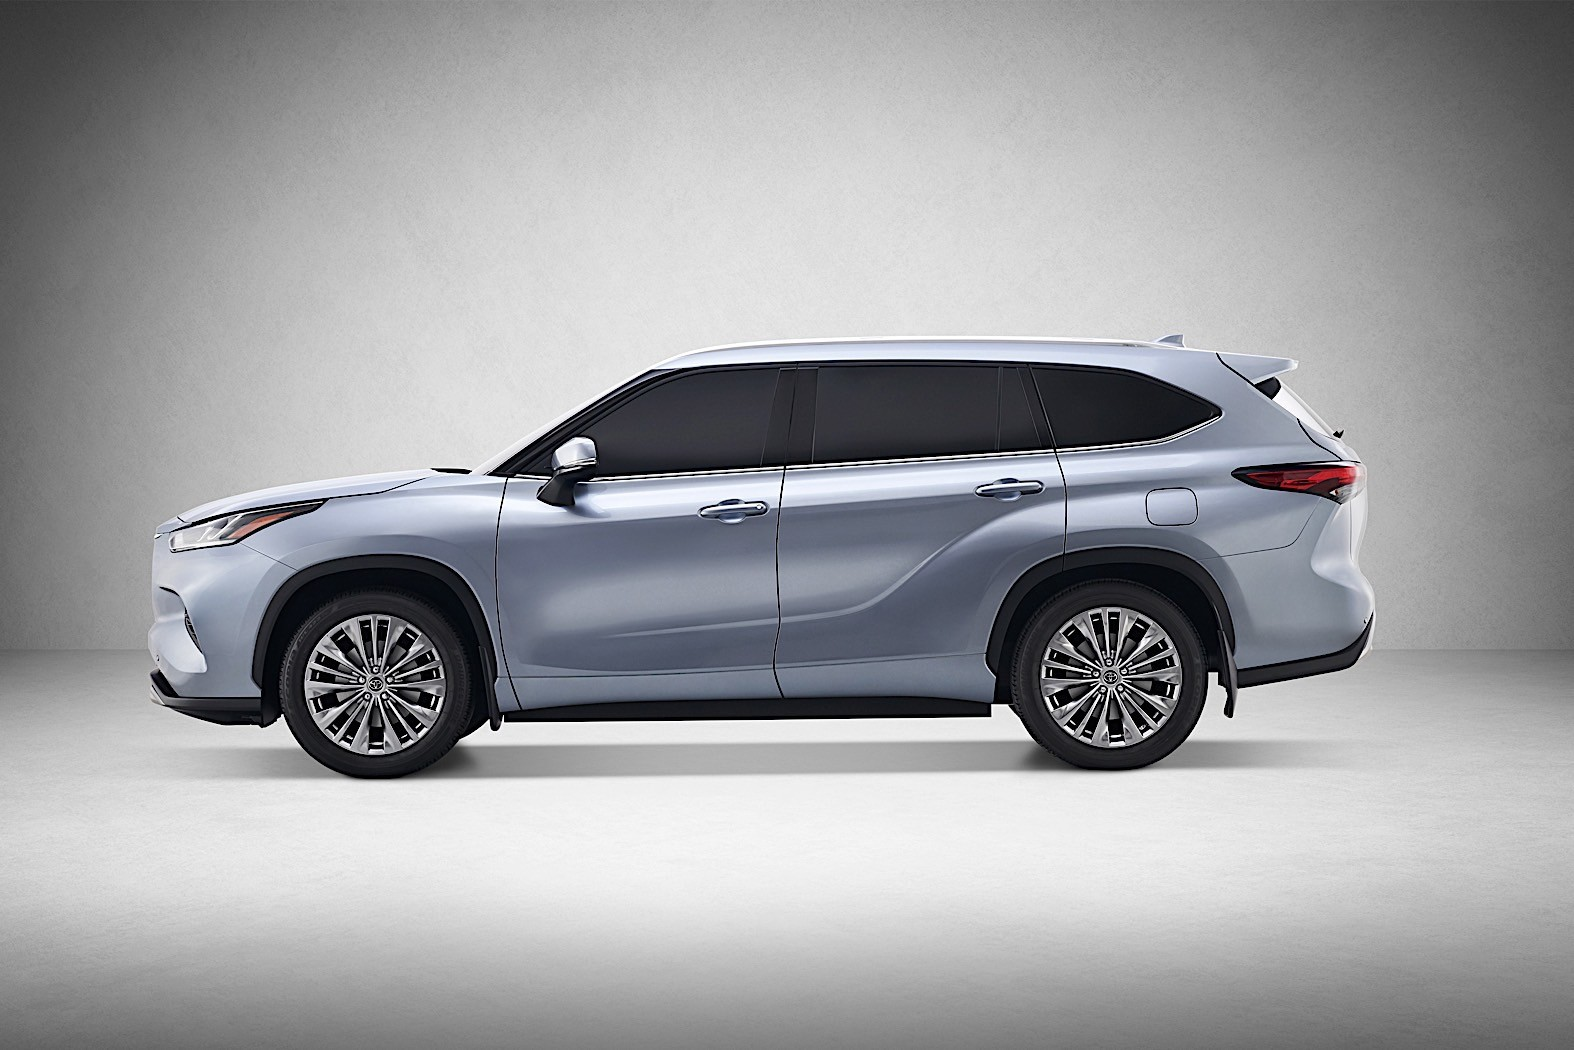 2020 Toyota Highlander Unveiled in New York - autoevolution